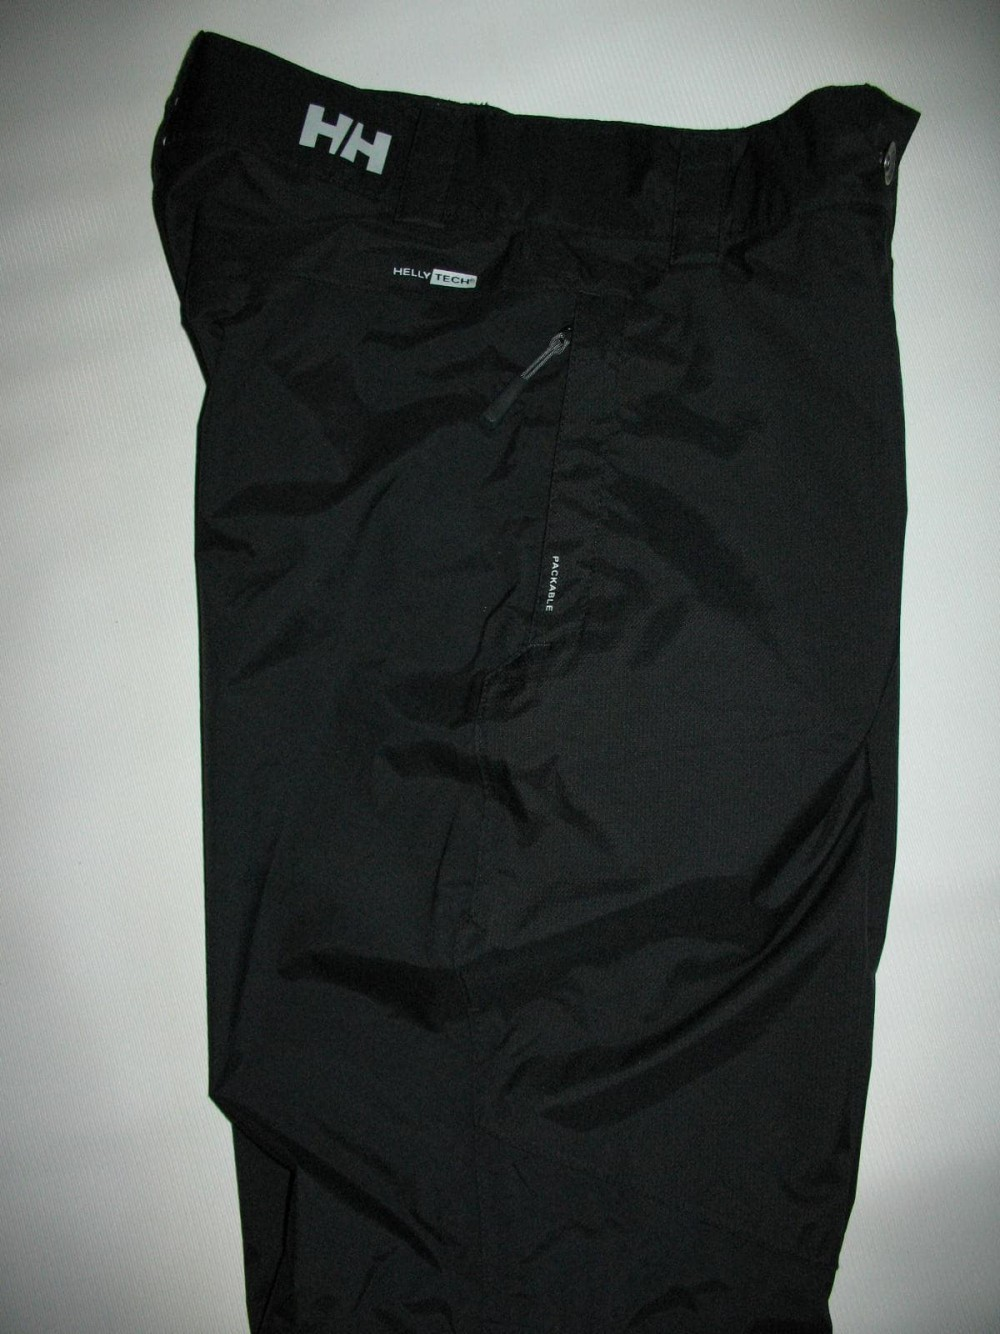 Штаны HELLY HANSEN hellytech packable pants lady (размер XS) - 5